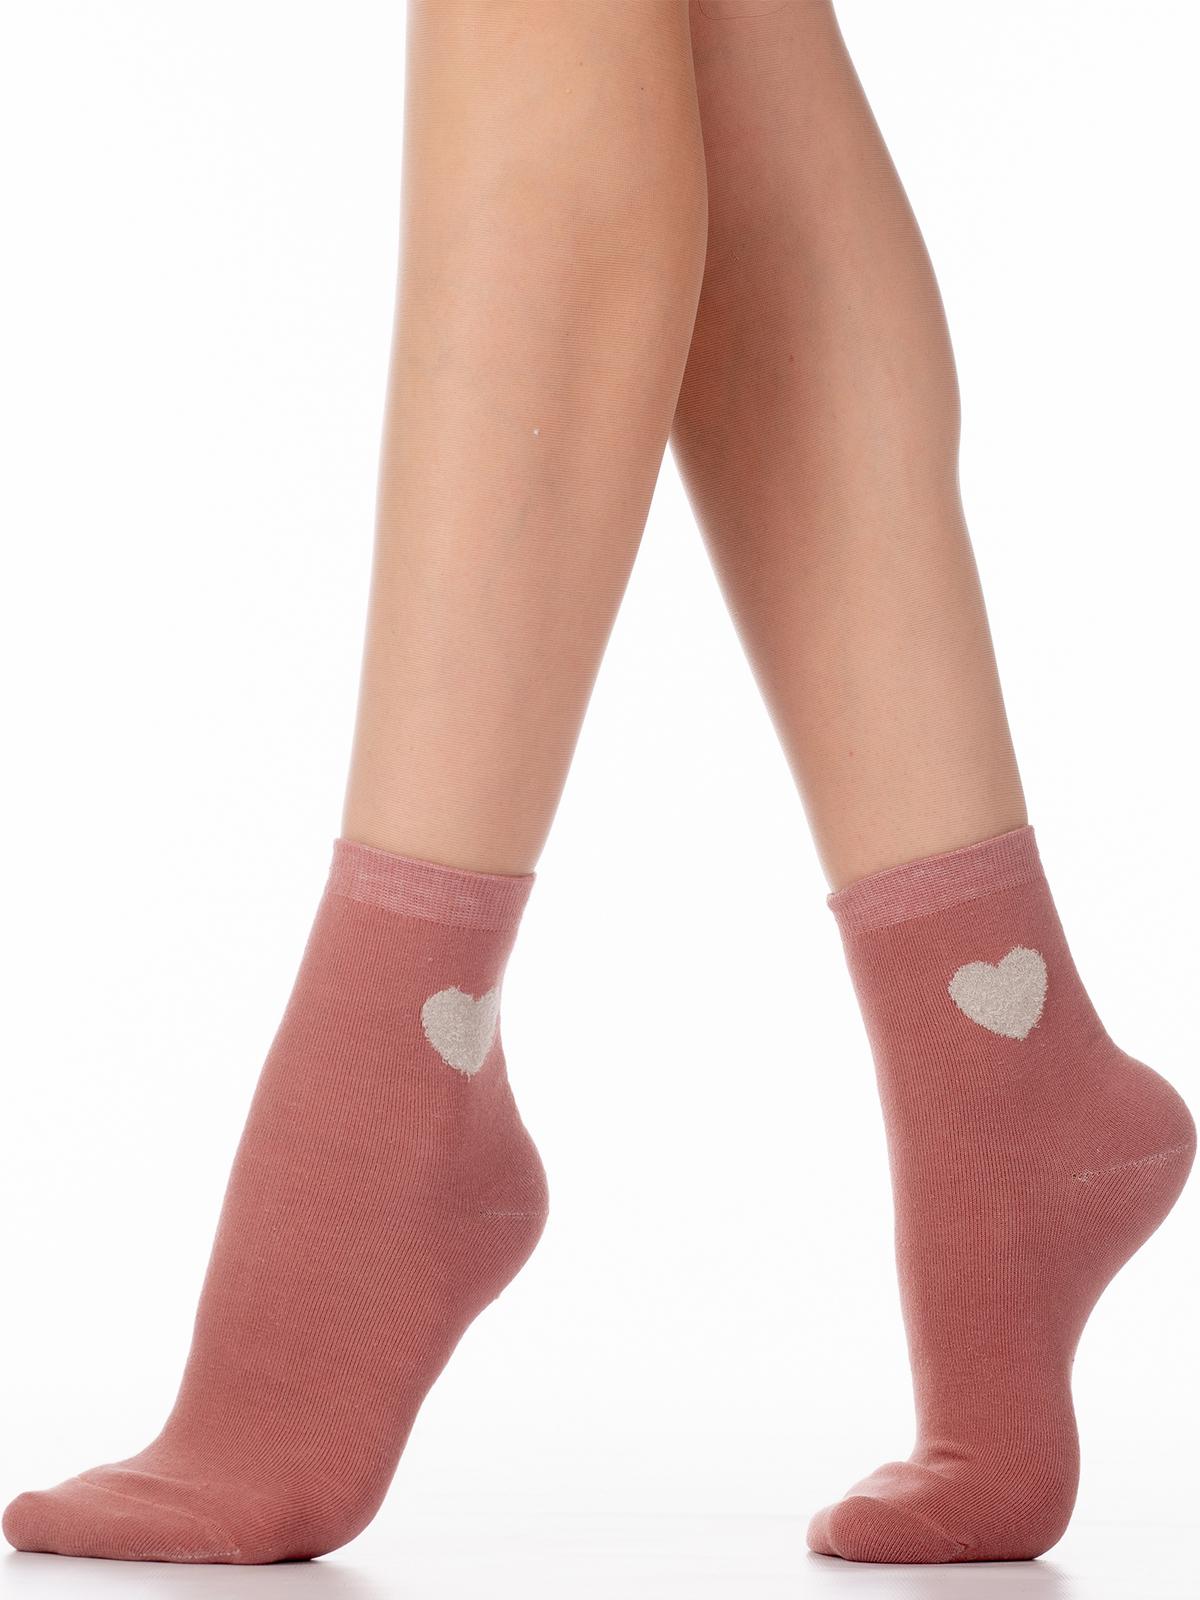 Носки женские Hobby Line HOBBY 3Д78 розовые 36-40